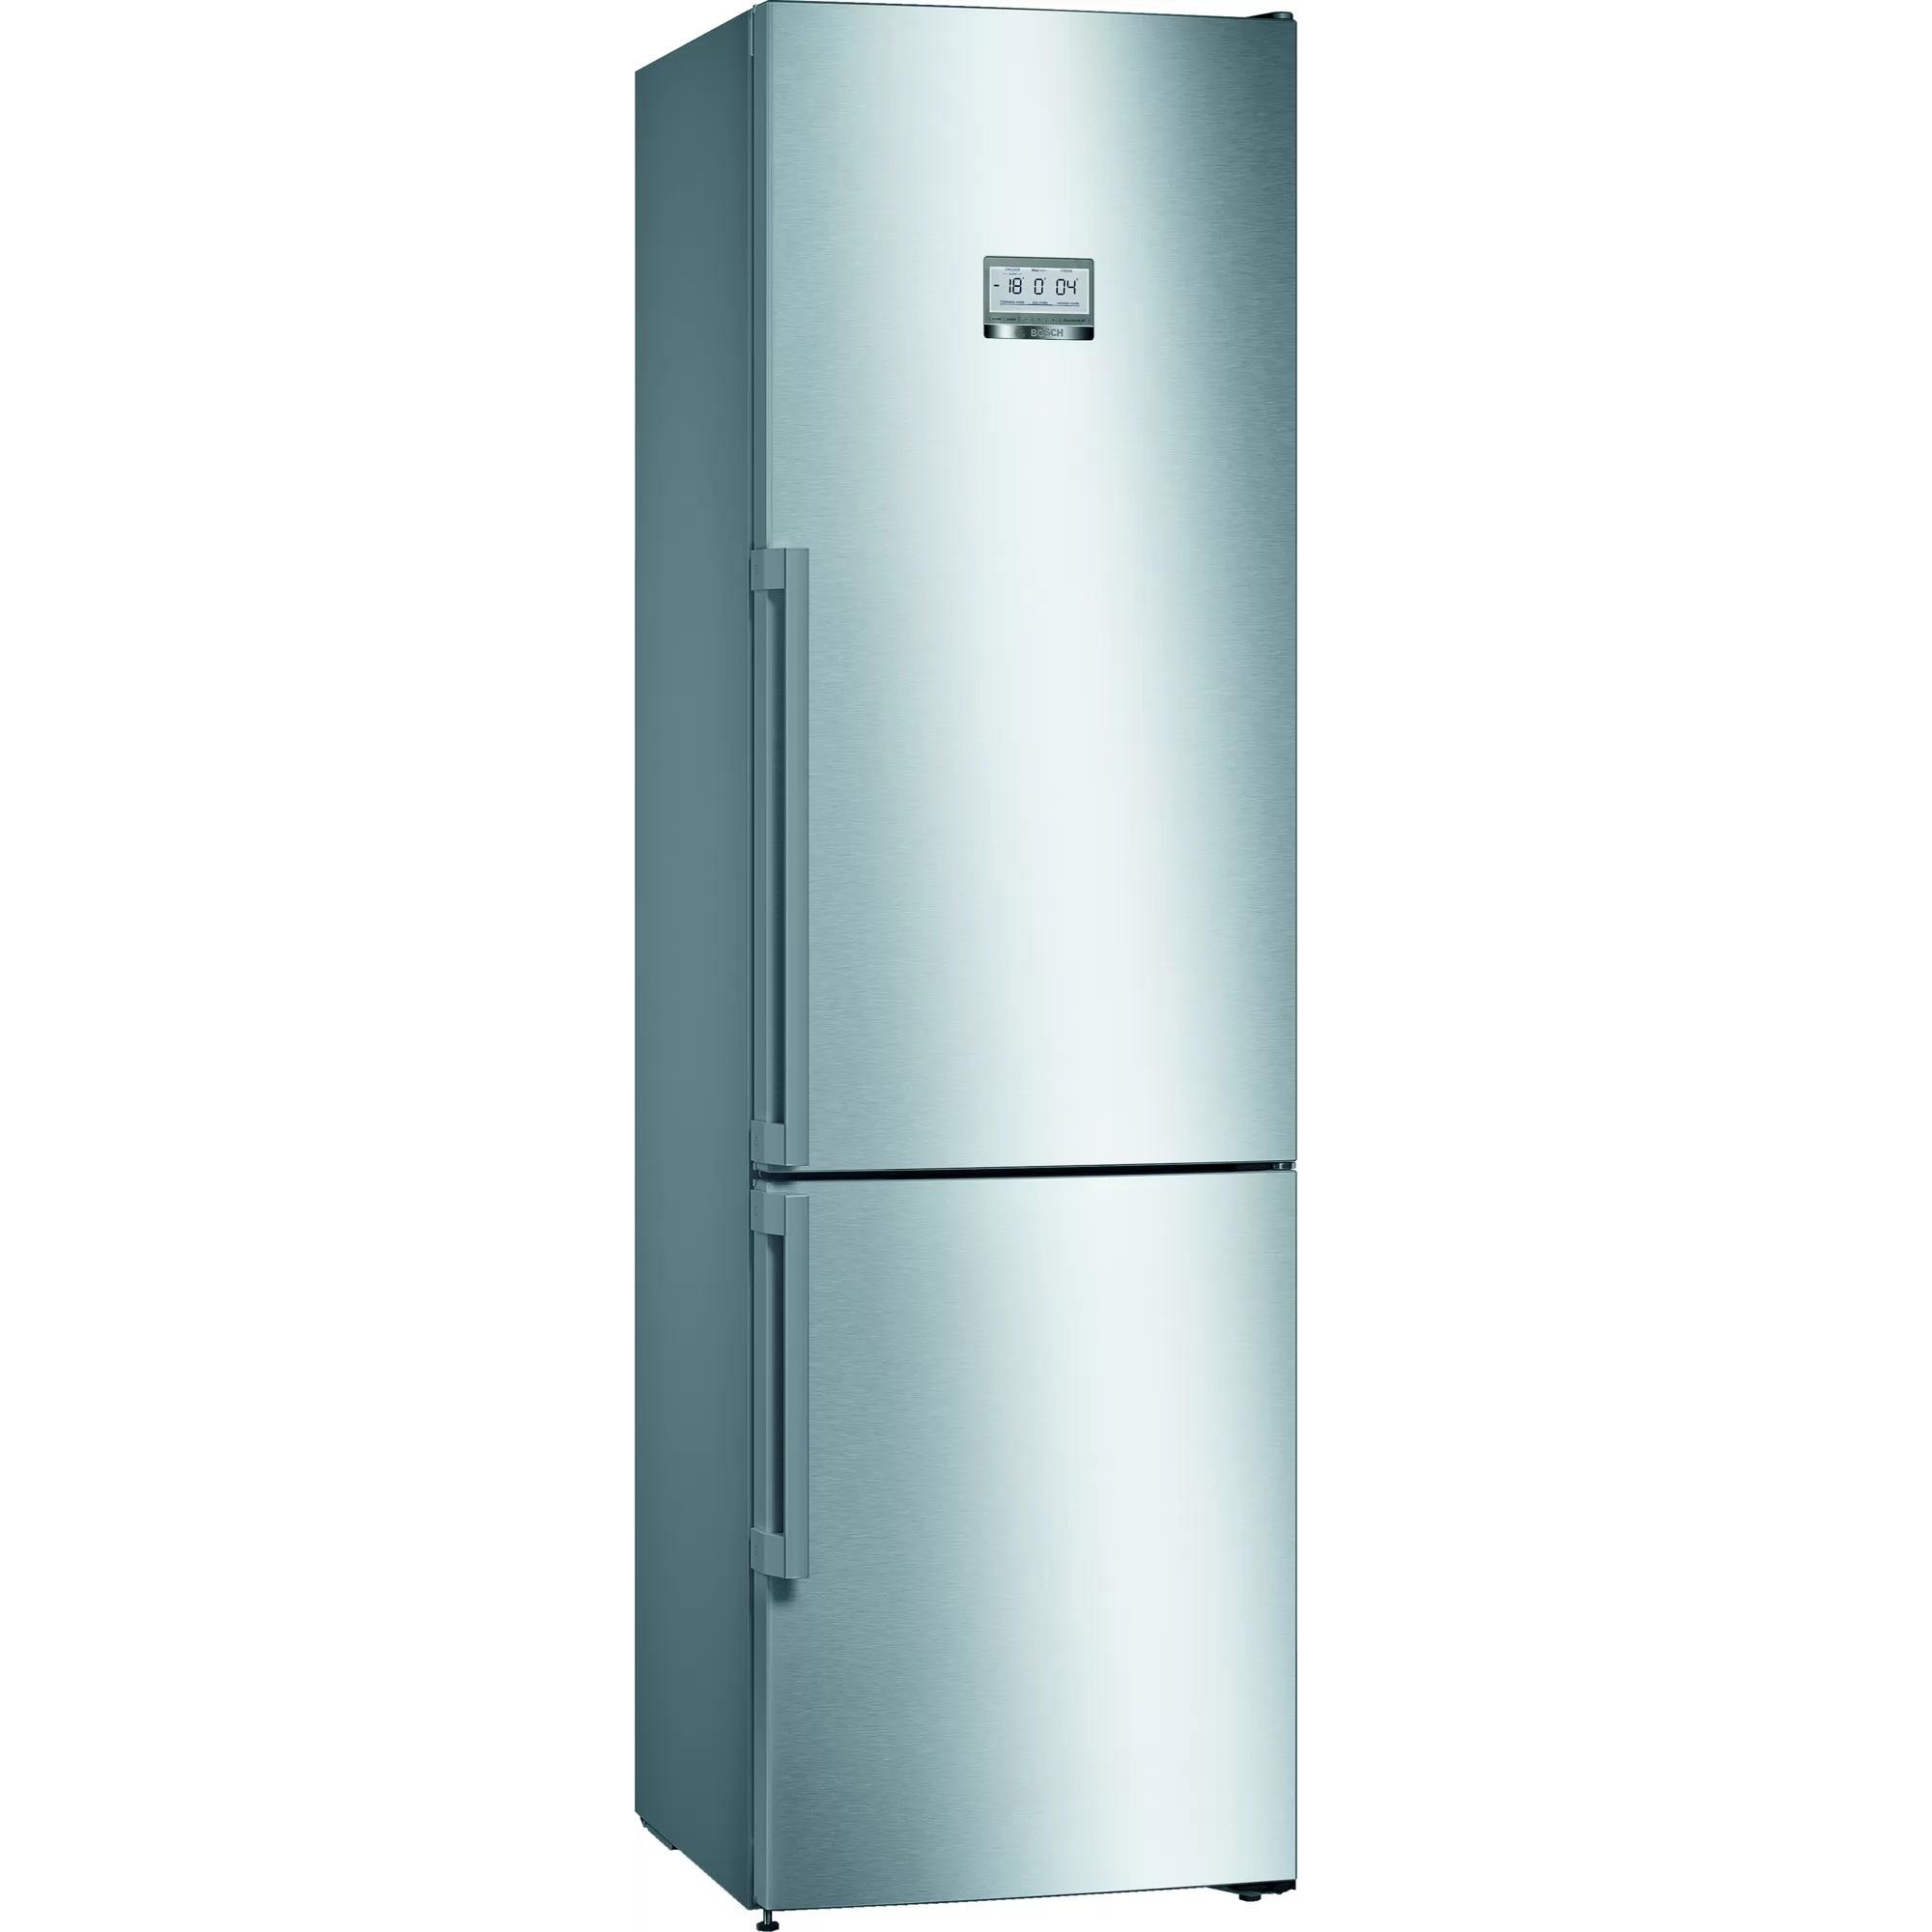 Fotografie Combina frigorifica Bosch KGF39PIDP, 345 l, Clasa D, NoFrost, VitaFresh, H 203 cm, Inox antiamprenta